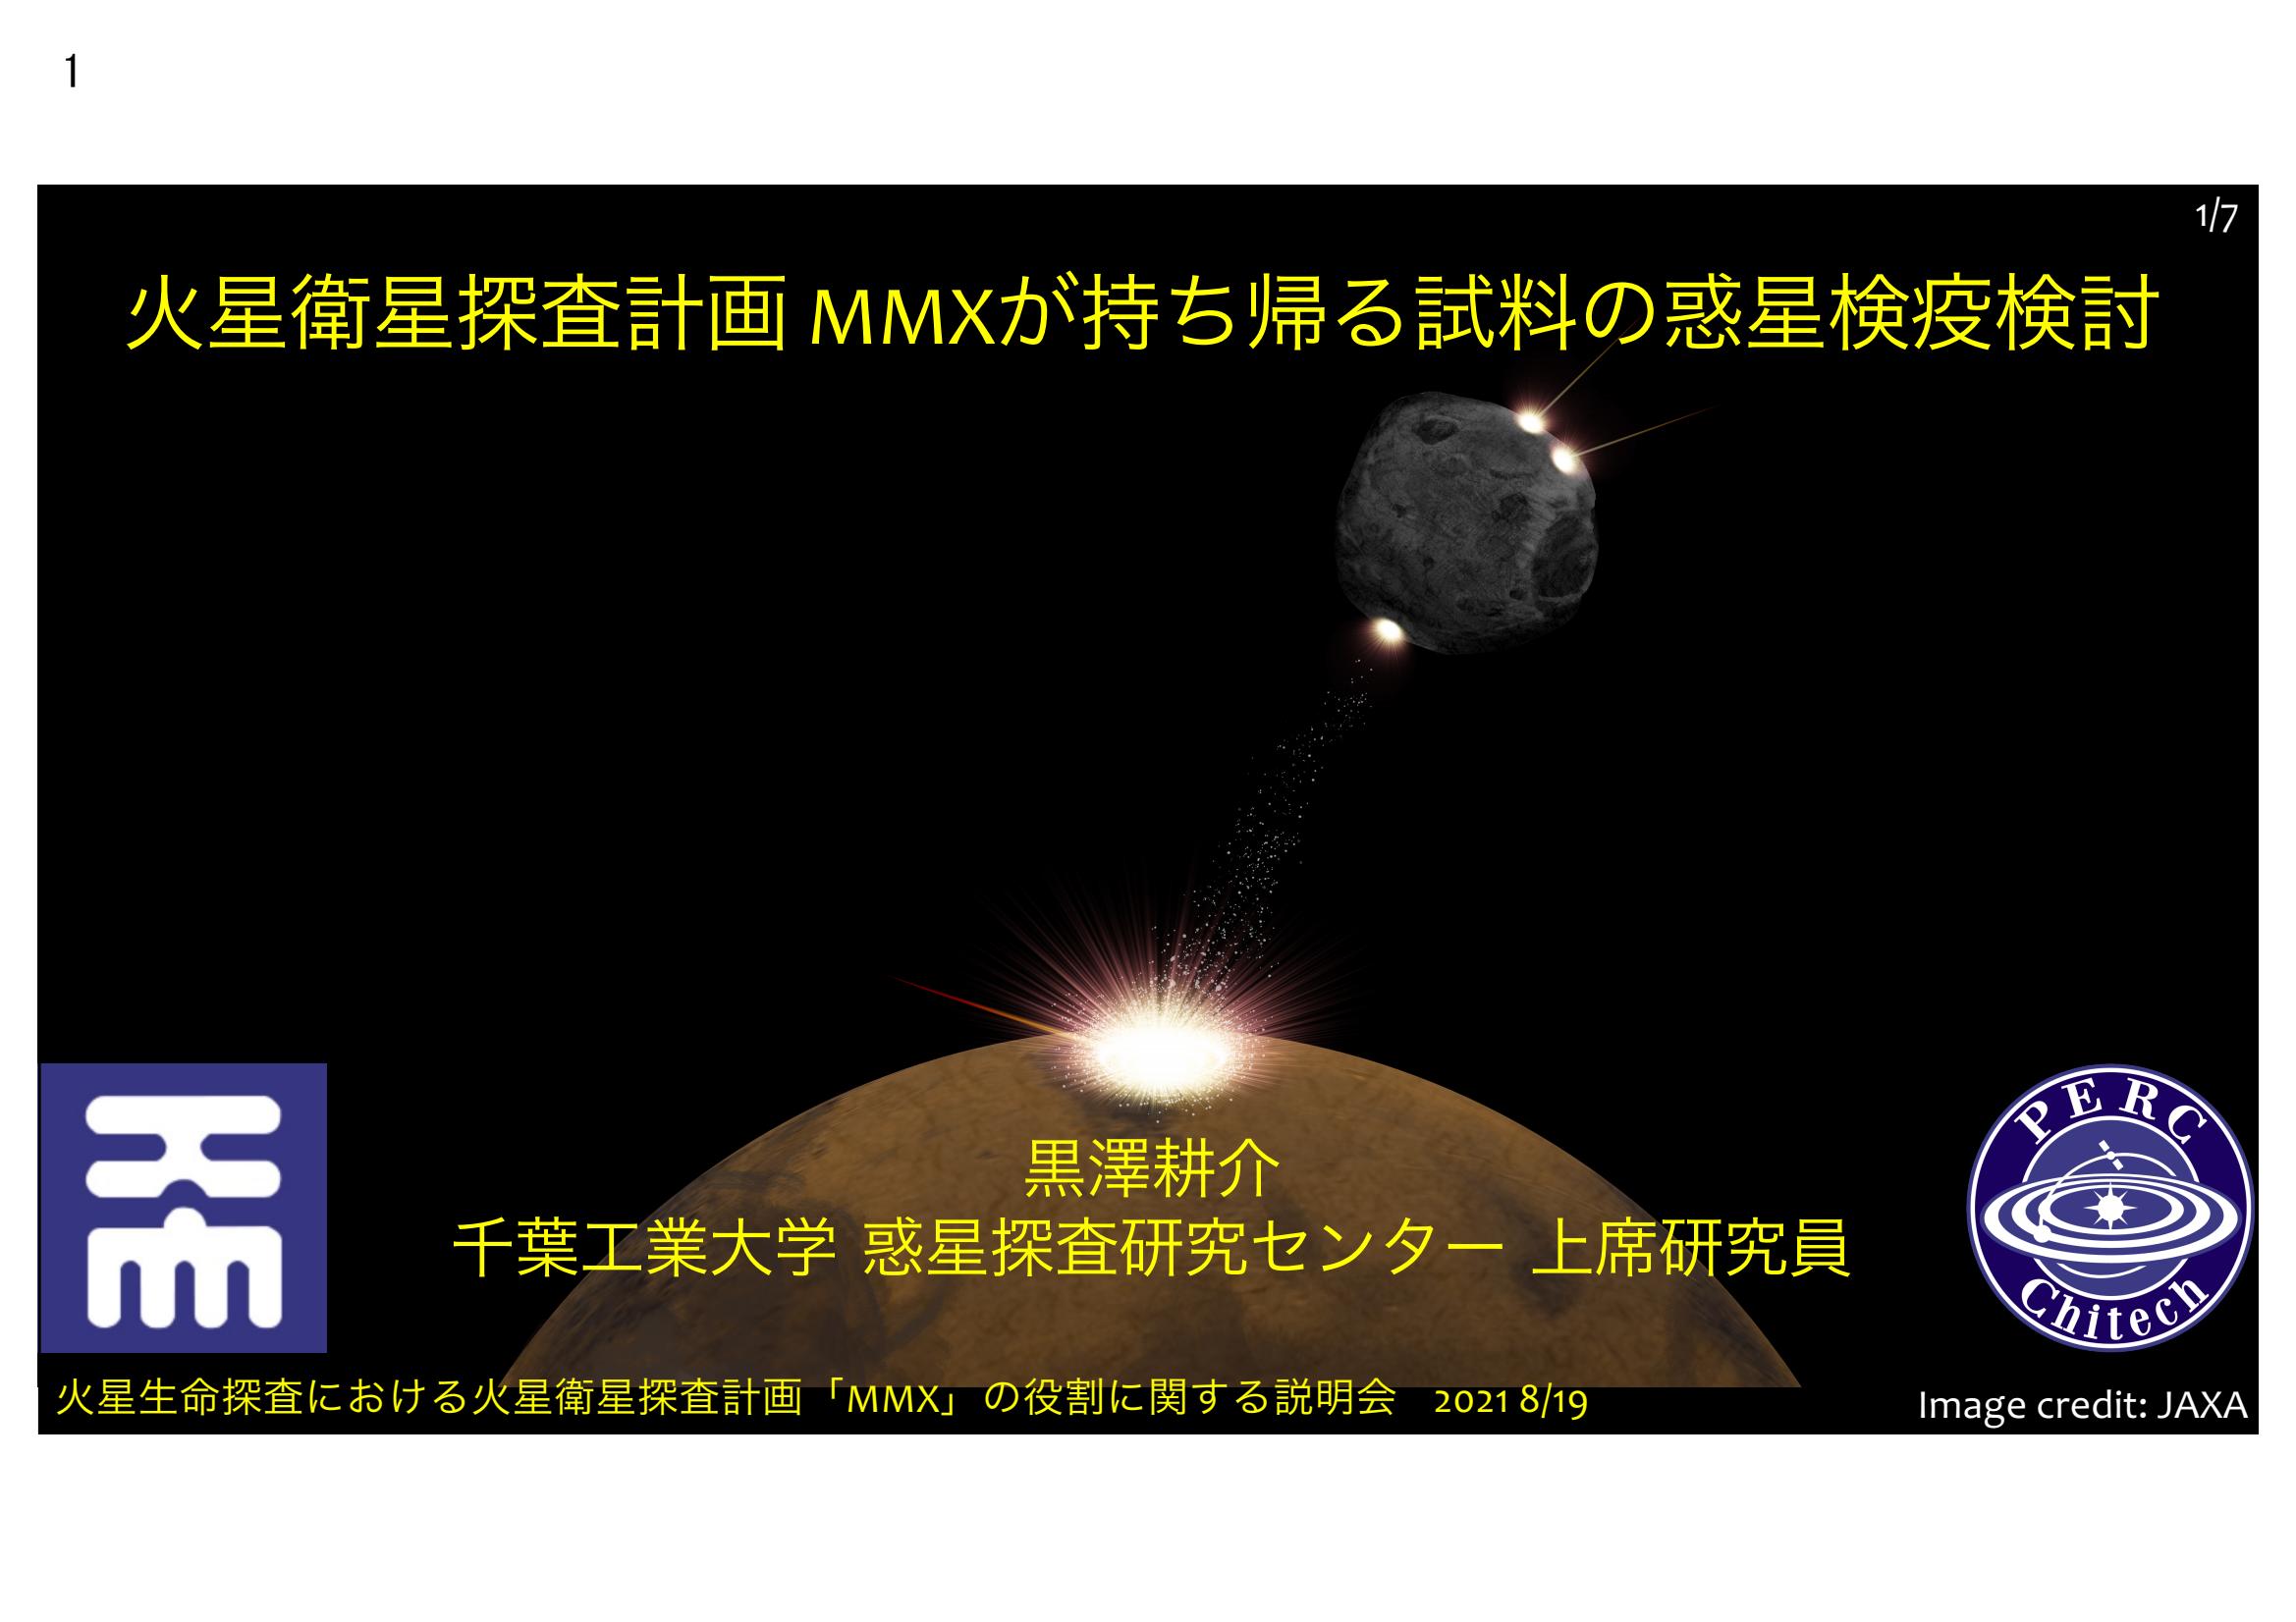 f:id:Imamura:20210819095334p:plain